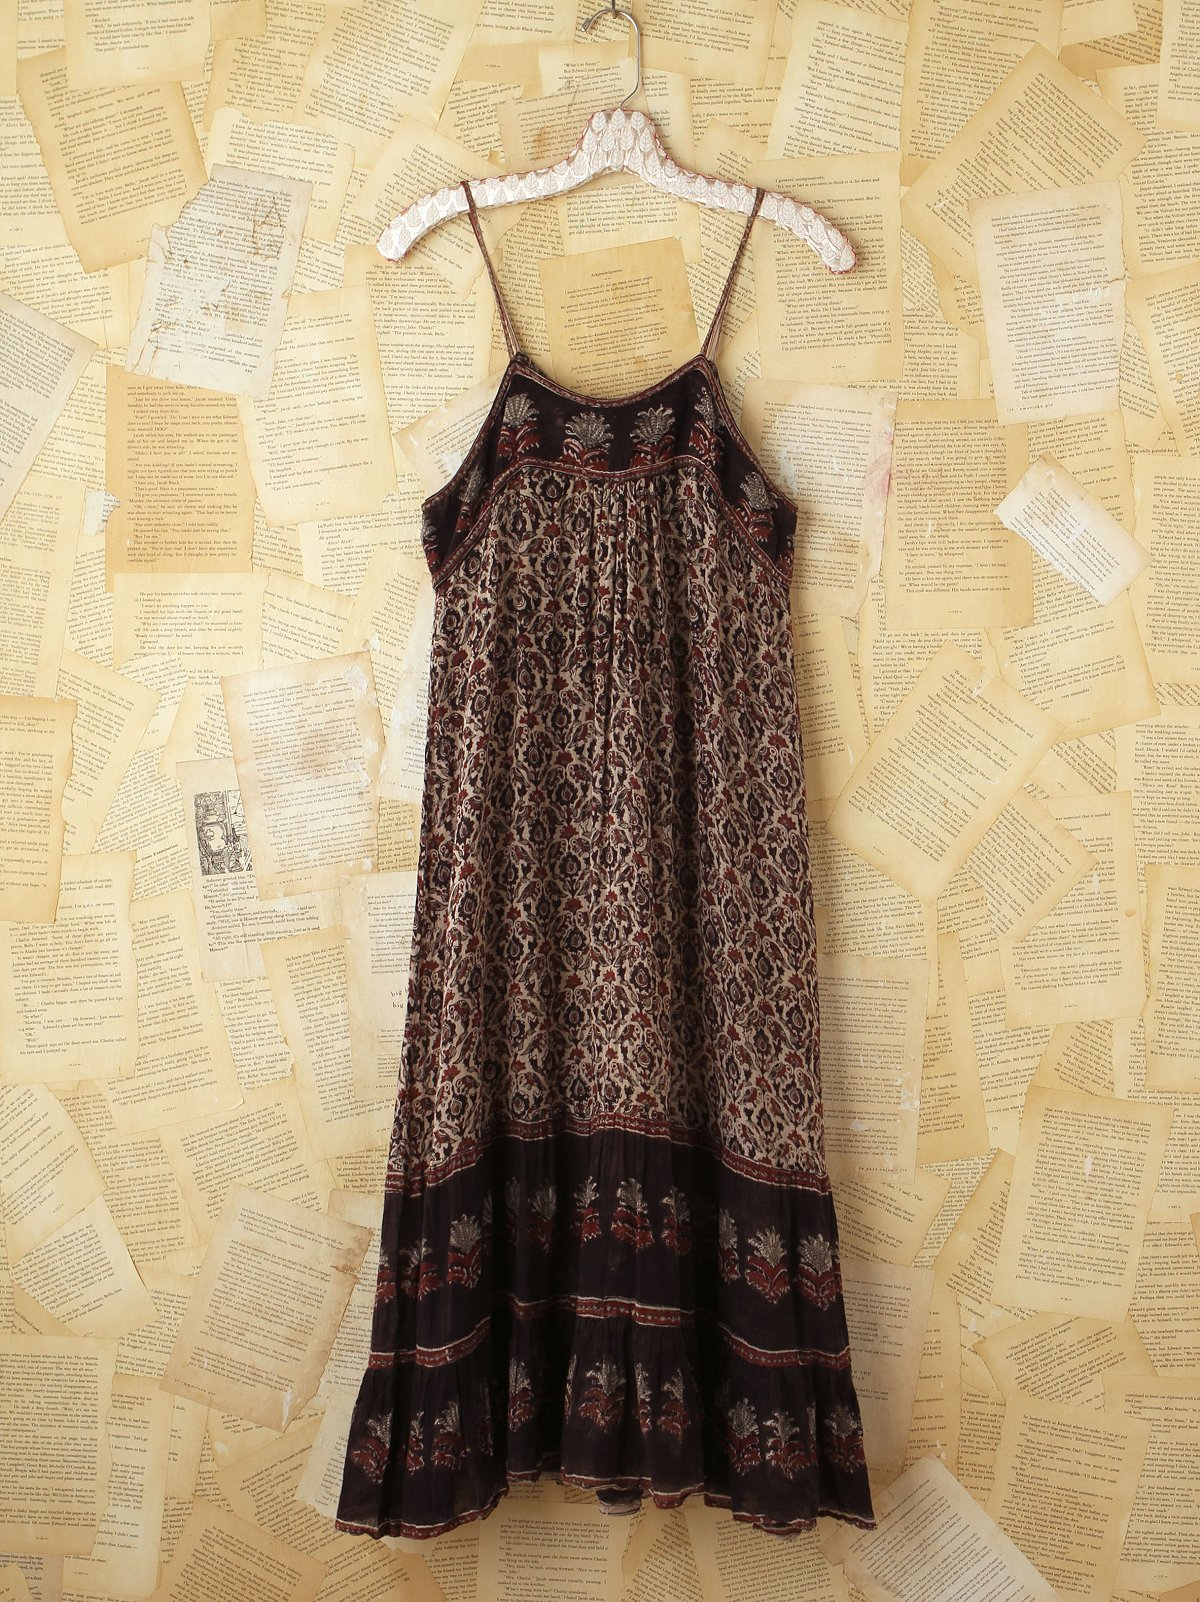 Vintage Boho Printed Gauzy Dress